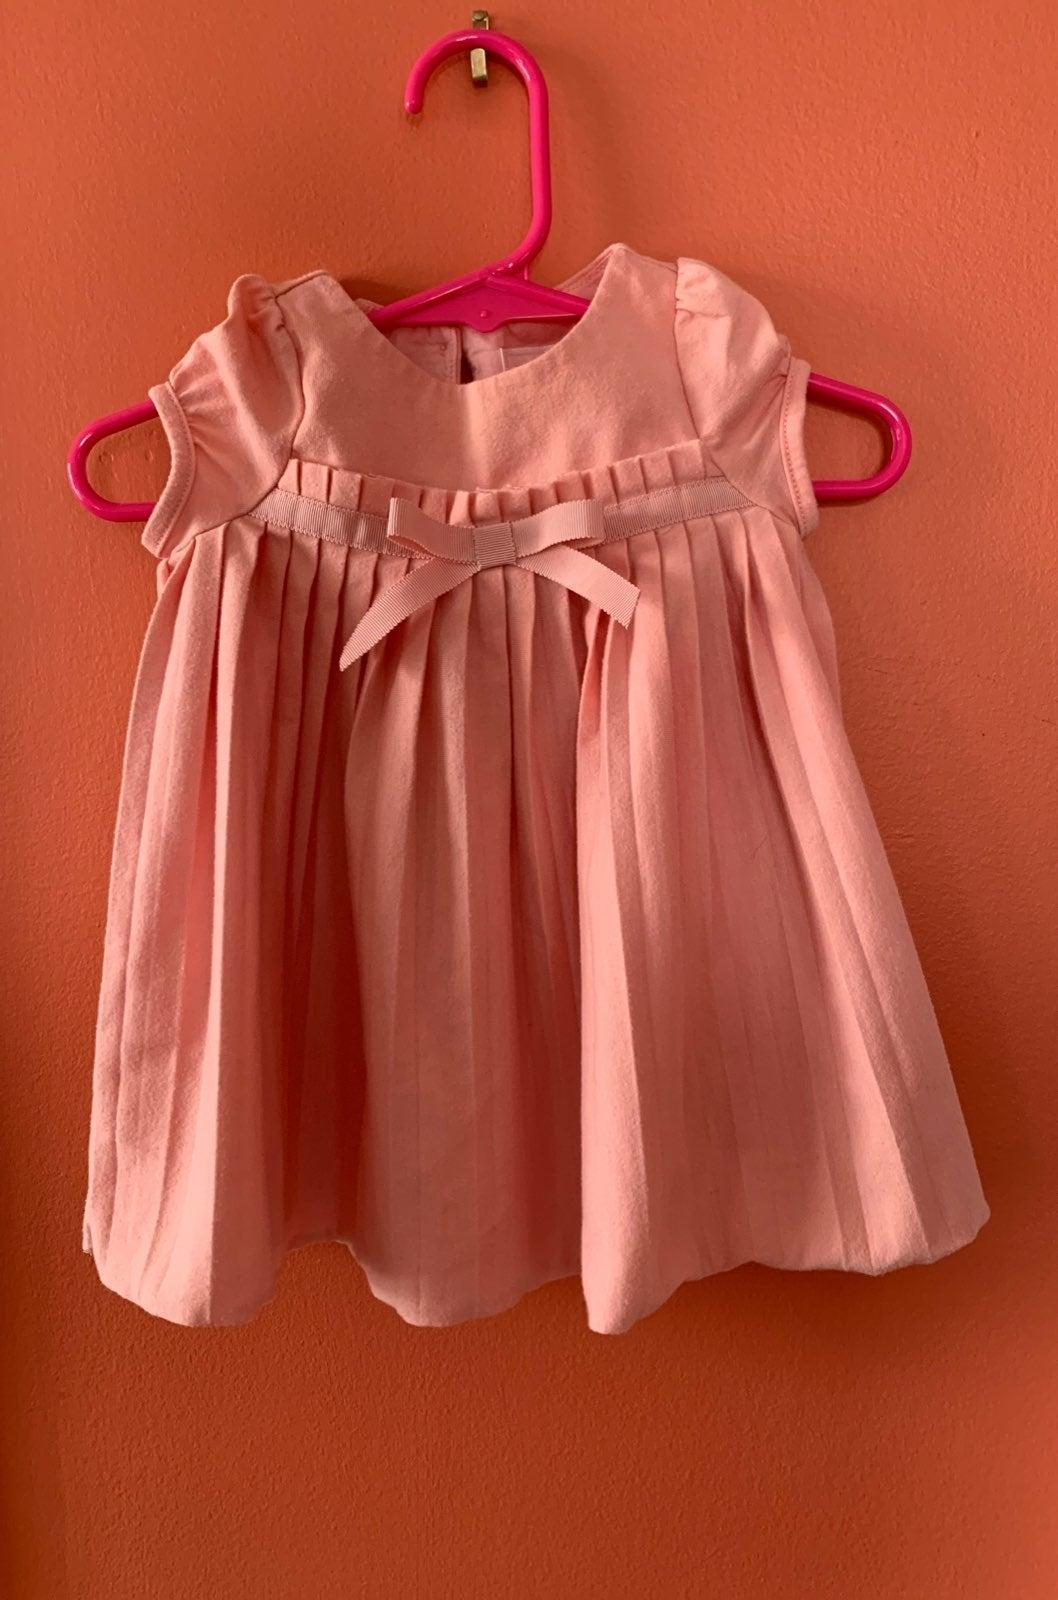 Janie and jack 6m pink baby dress